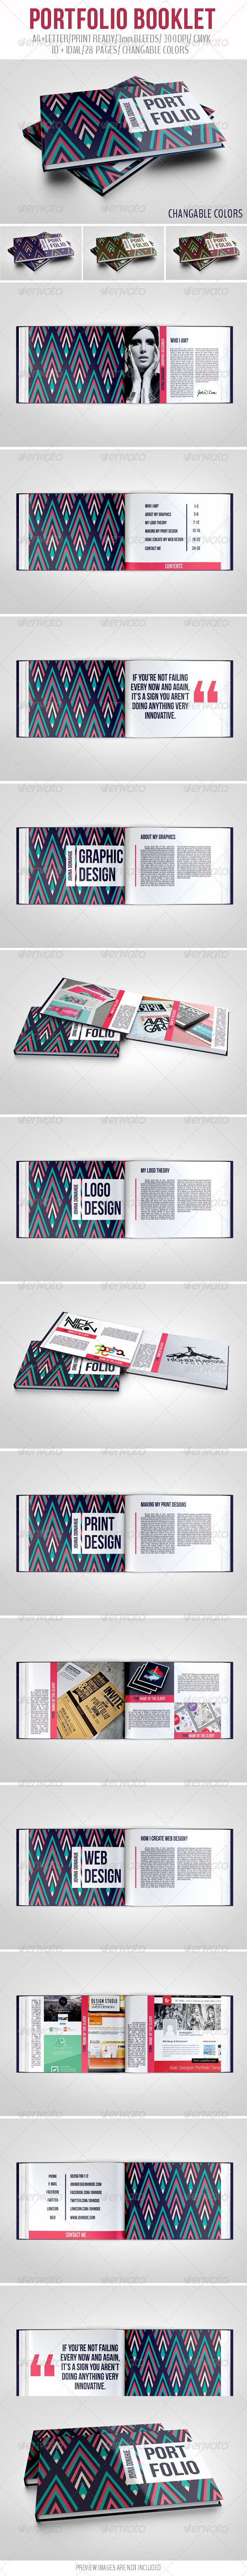 Portfolio Booklet #portfolio #brochure #print #template #abstract #indesign